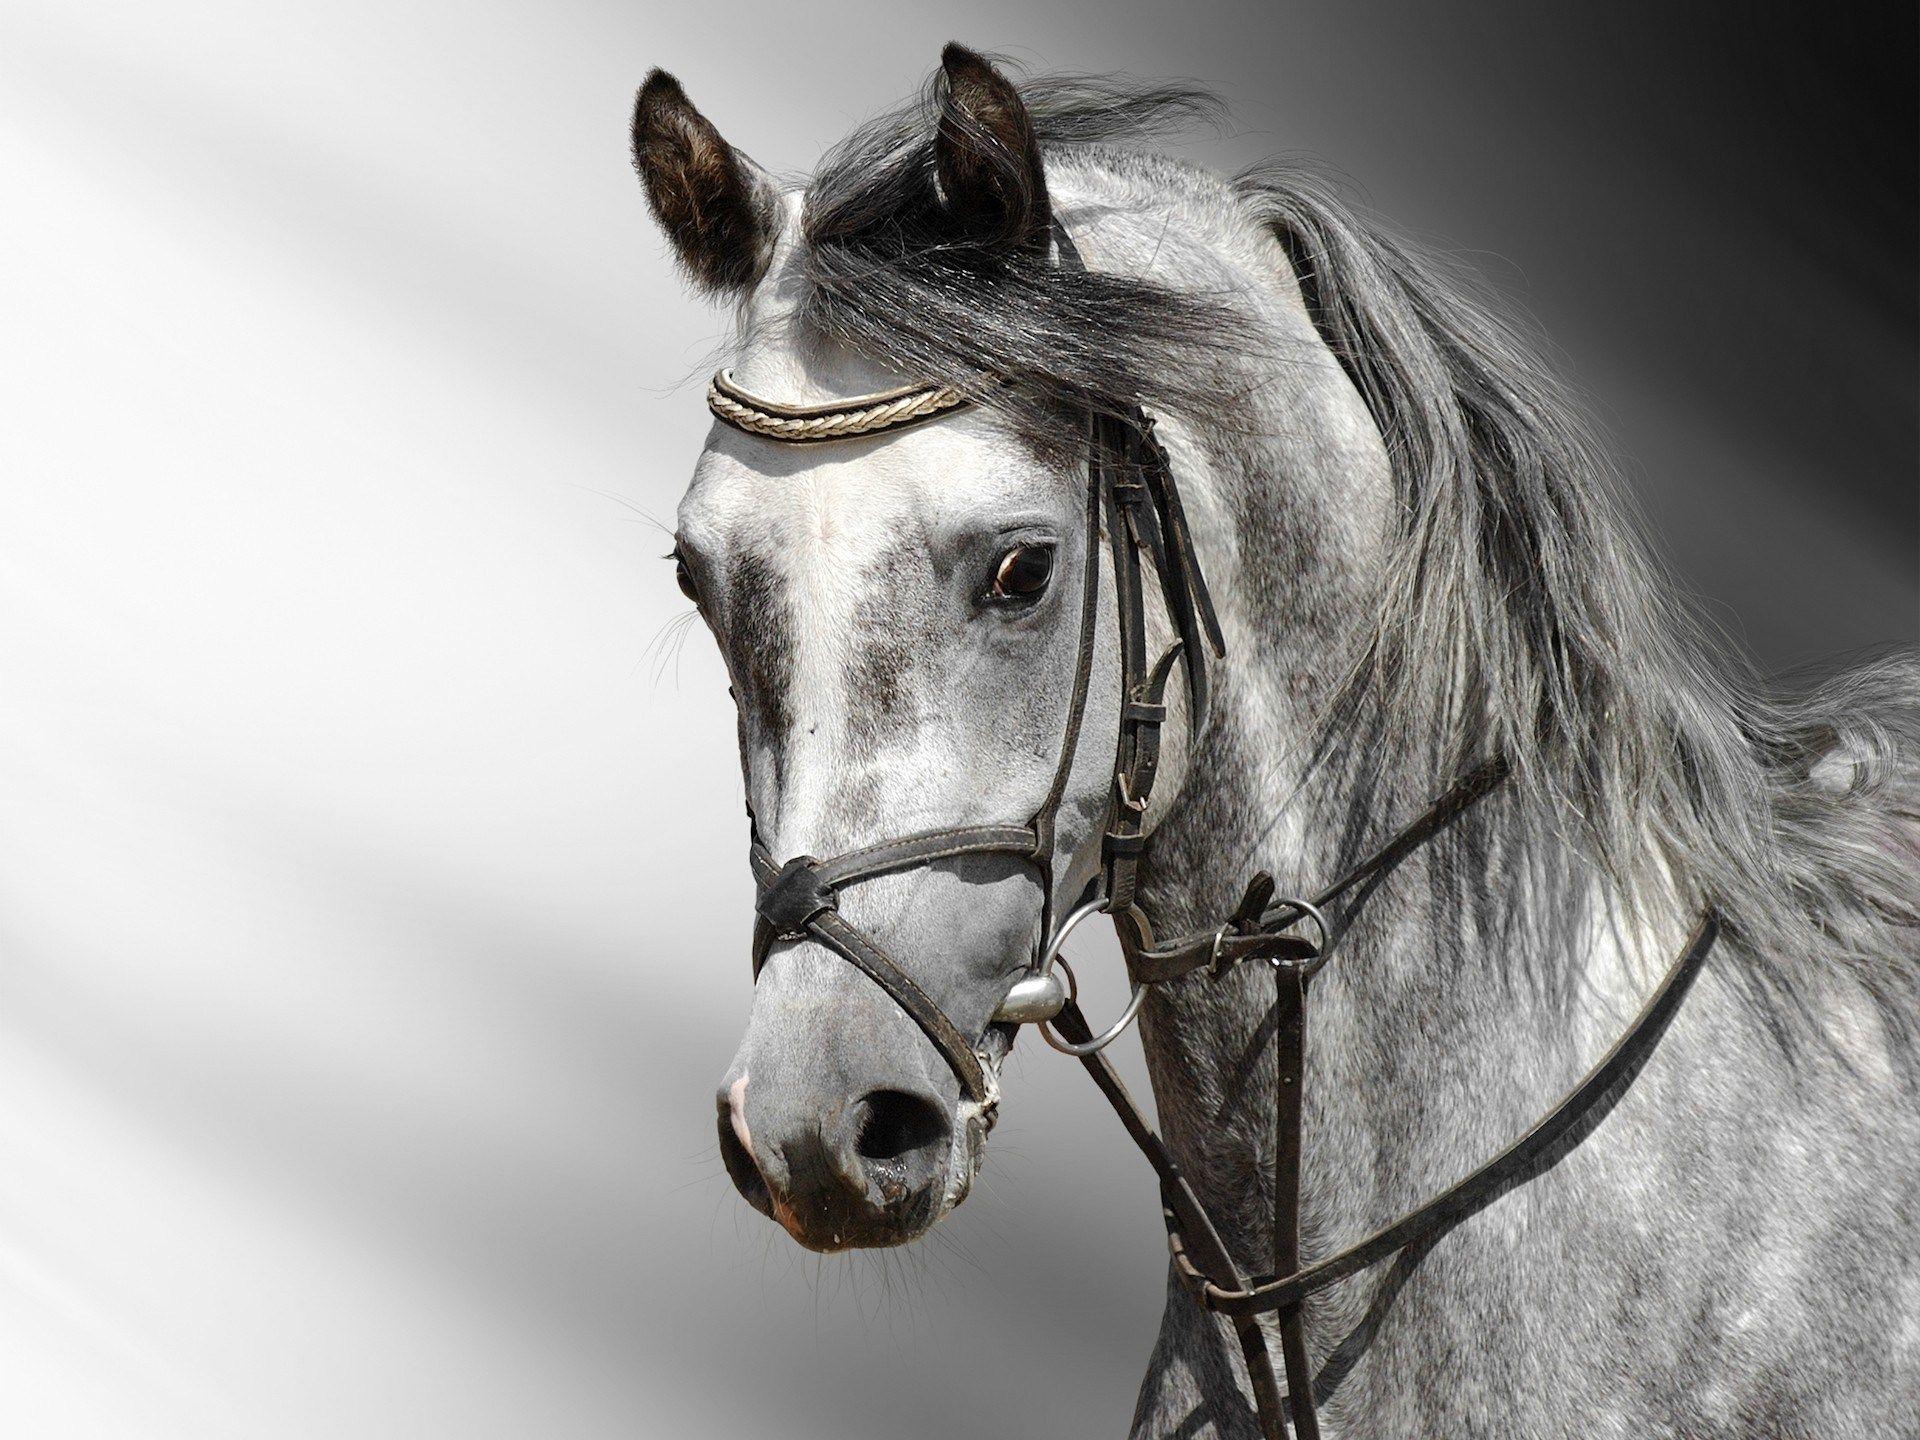 Best Wallpaper Horse Fairy - cdbcaeb624738c5b4f82e19544bf127f  HD_363626.jpg